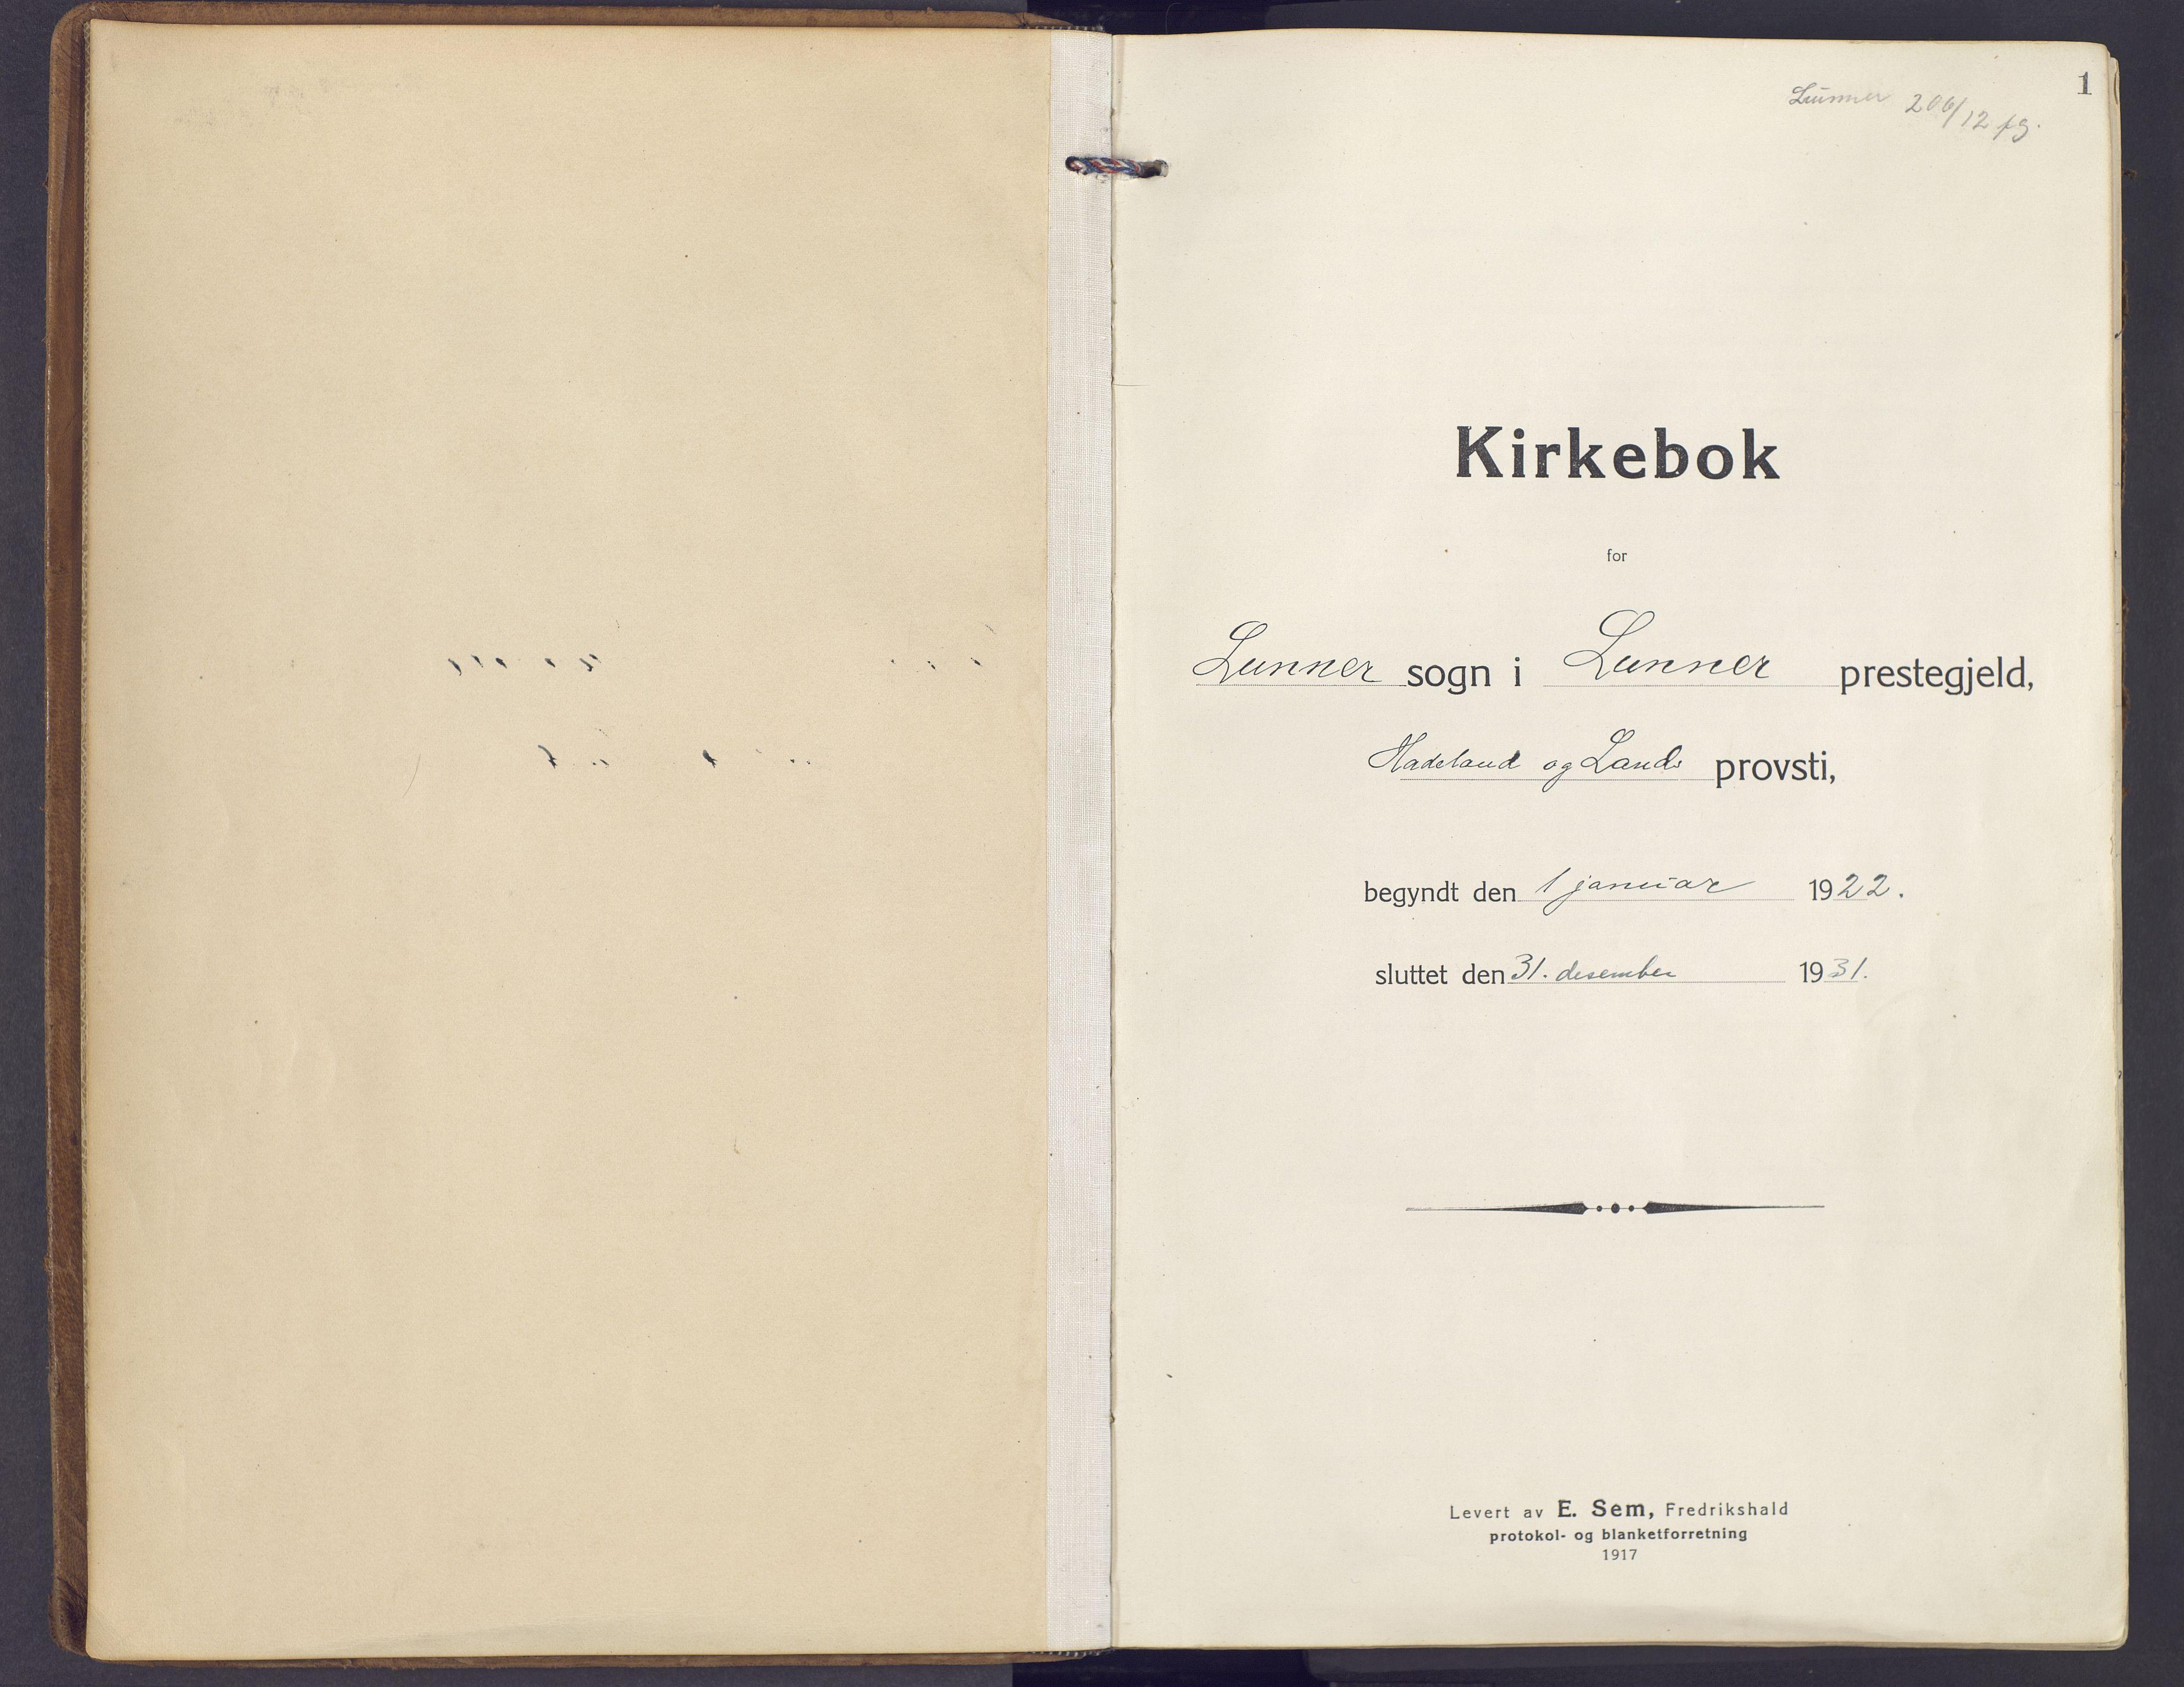 SAH, Lunner prestekontor, H/Ha/Haa/L0002: Ministerialbok nr. 2, 1922-1931, s. 1